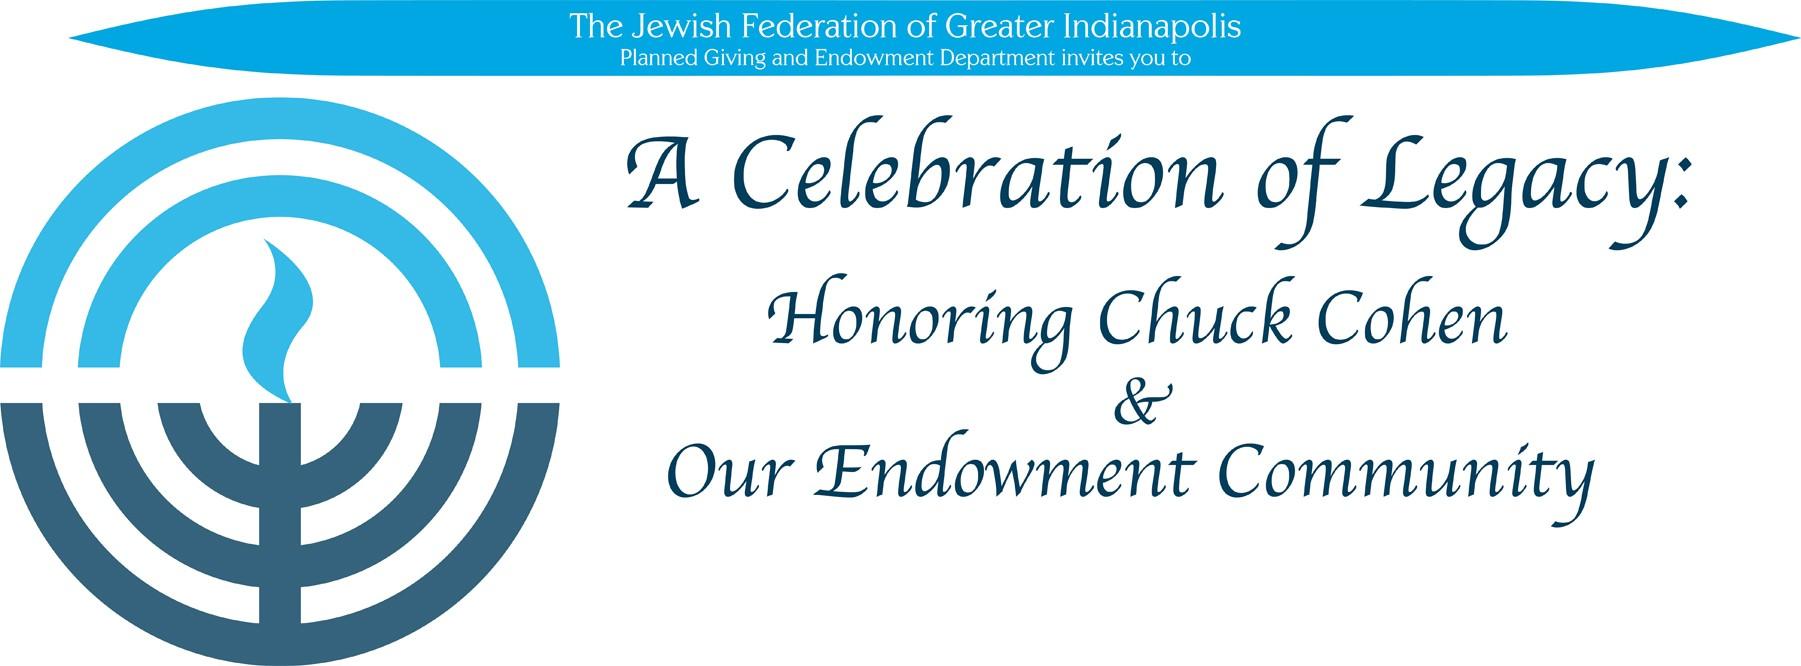 2016 endowment recognition banner.jpg